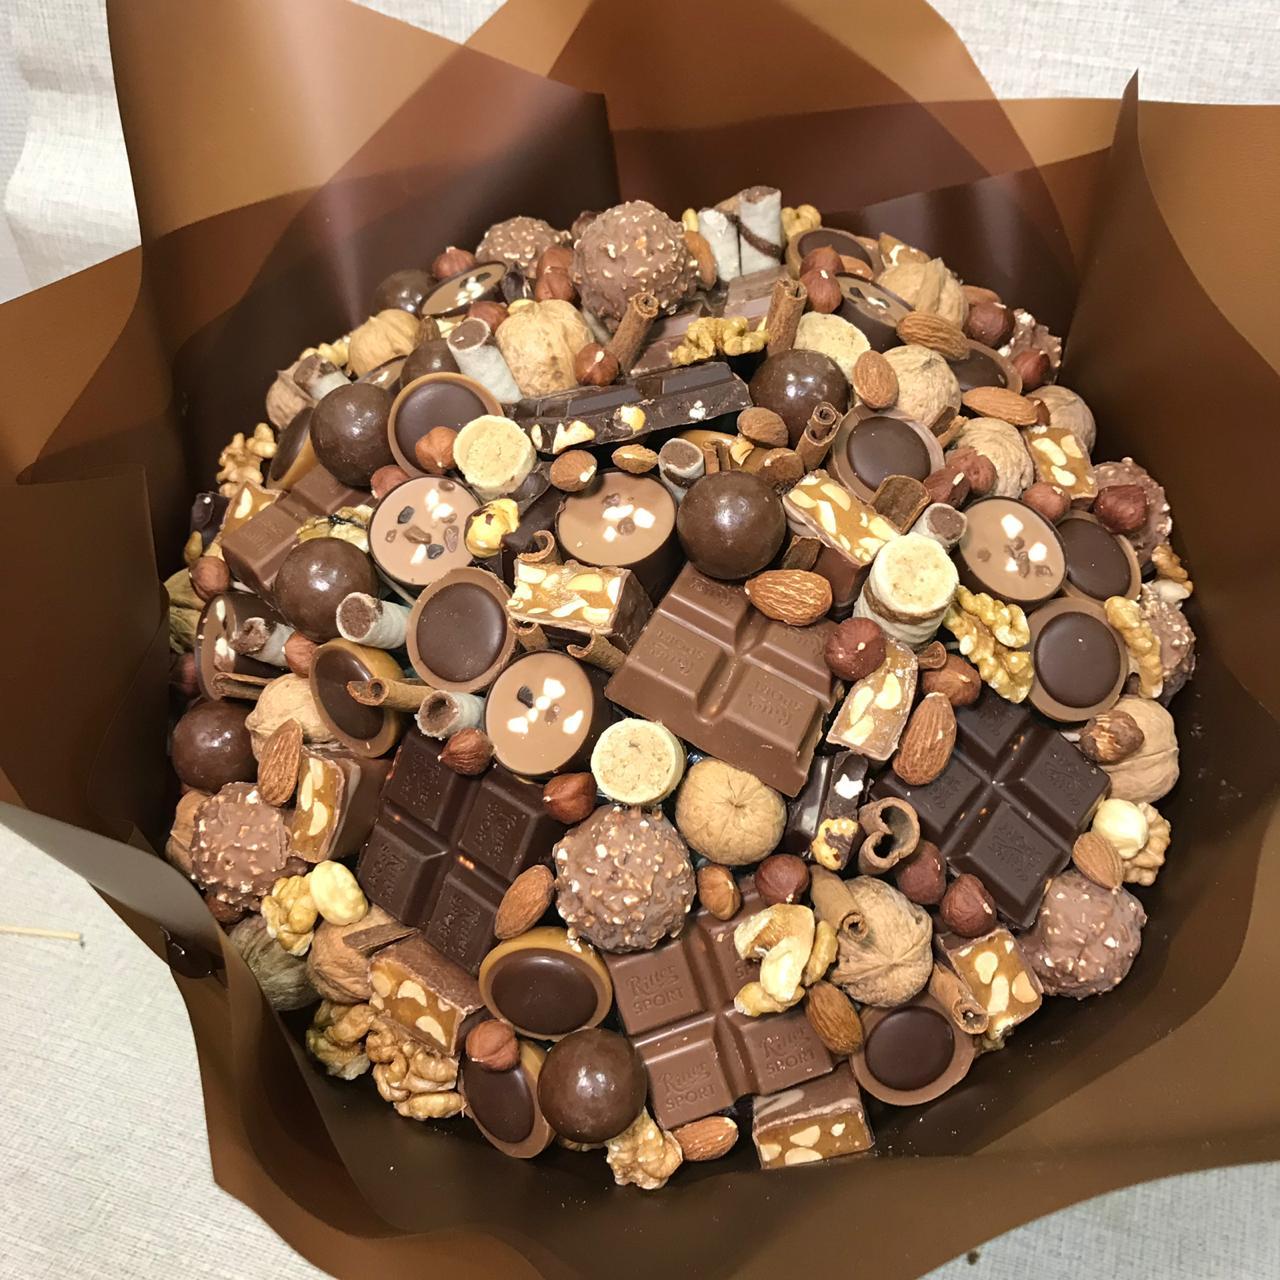 картинки со сладостями и конфетами